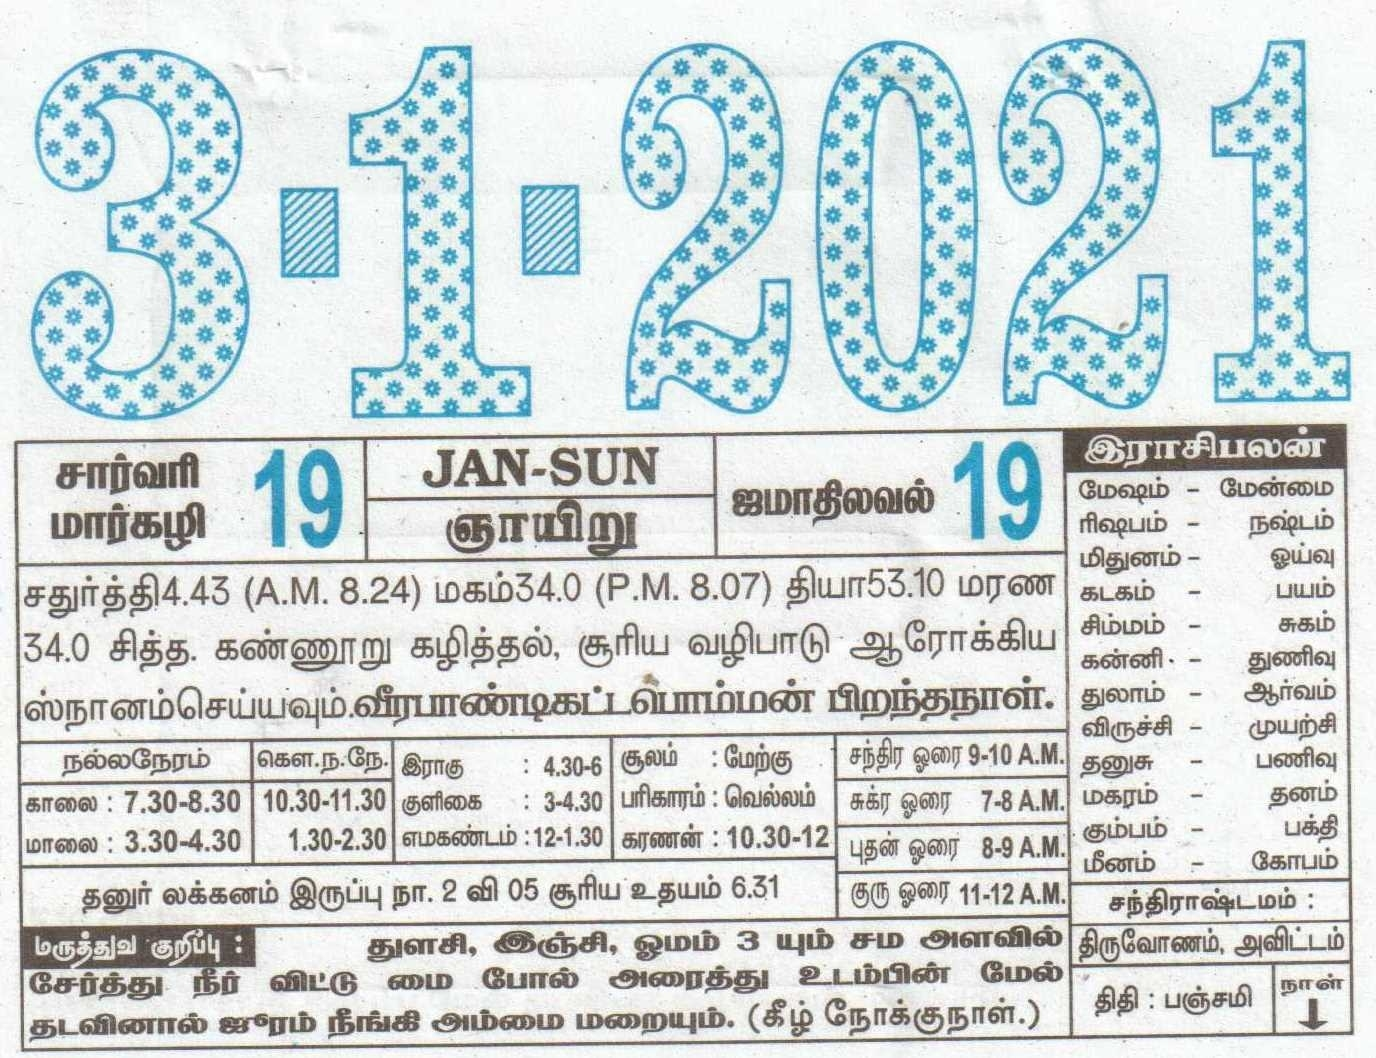 03-01-2021 Daily Calendar | Date 03 , January Daily Tear Off Calendar | Daily Panchangam Rasi Palan November 2021 Calendar Tamil